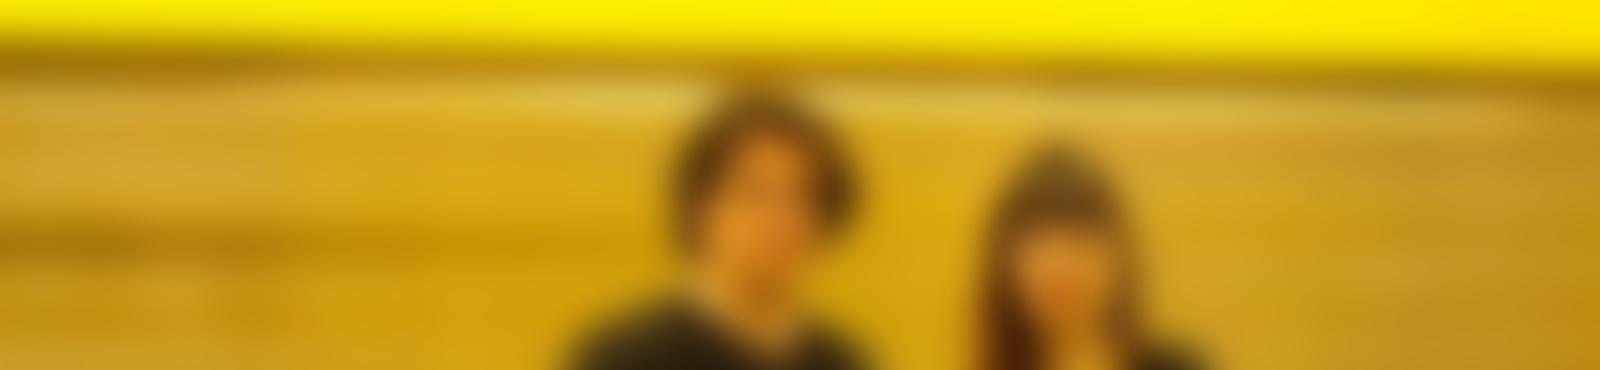 Blurred 91ea1461 8a9f 4a74 935c e48b6145d2e1